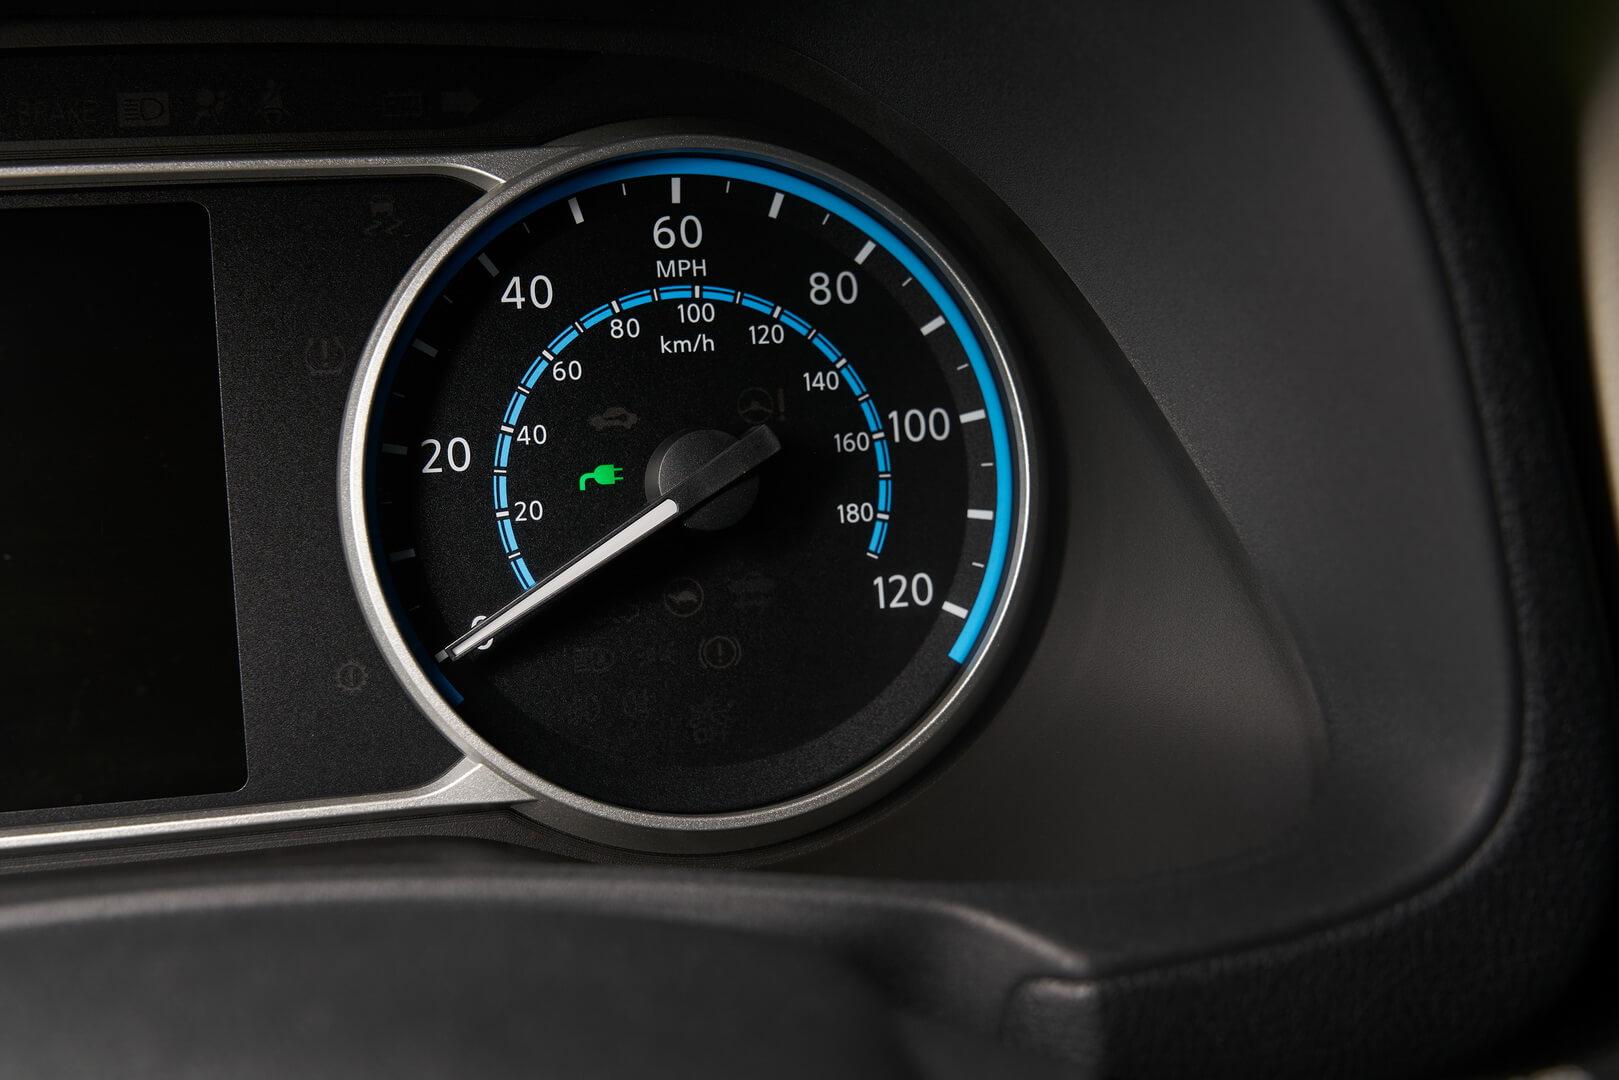 Фотография экоавто Nissan Leaf (40 кВт⋅ч) - фото 53